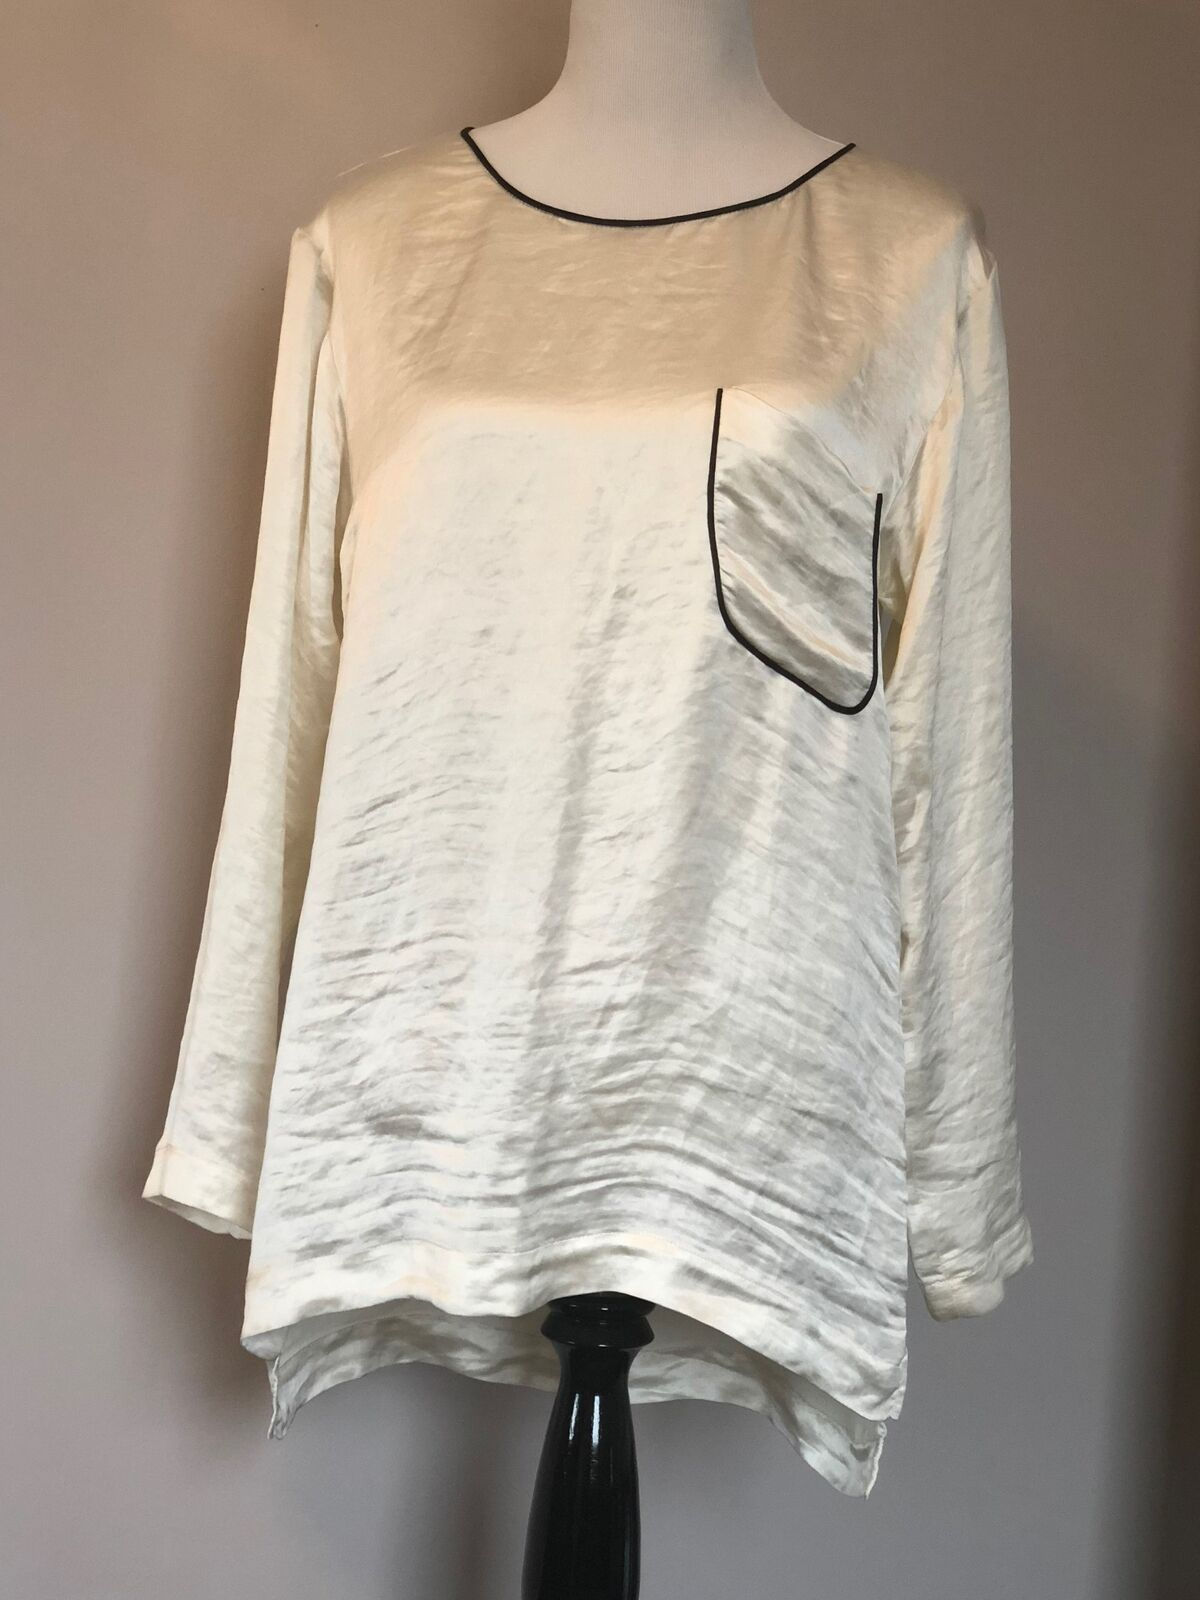 NWT THEORY Pearl Weiß Long Sleeve Crinkle Satin Top SZ M Style B0705506